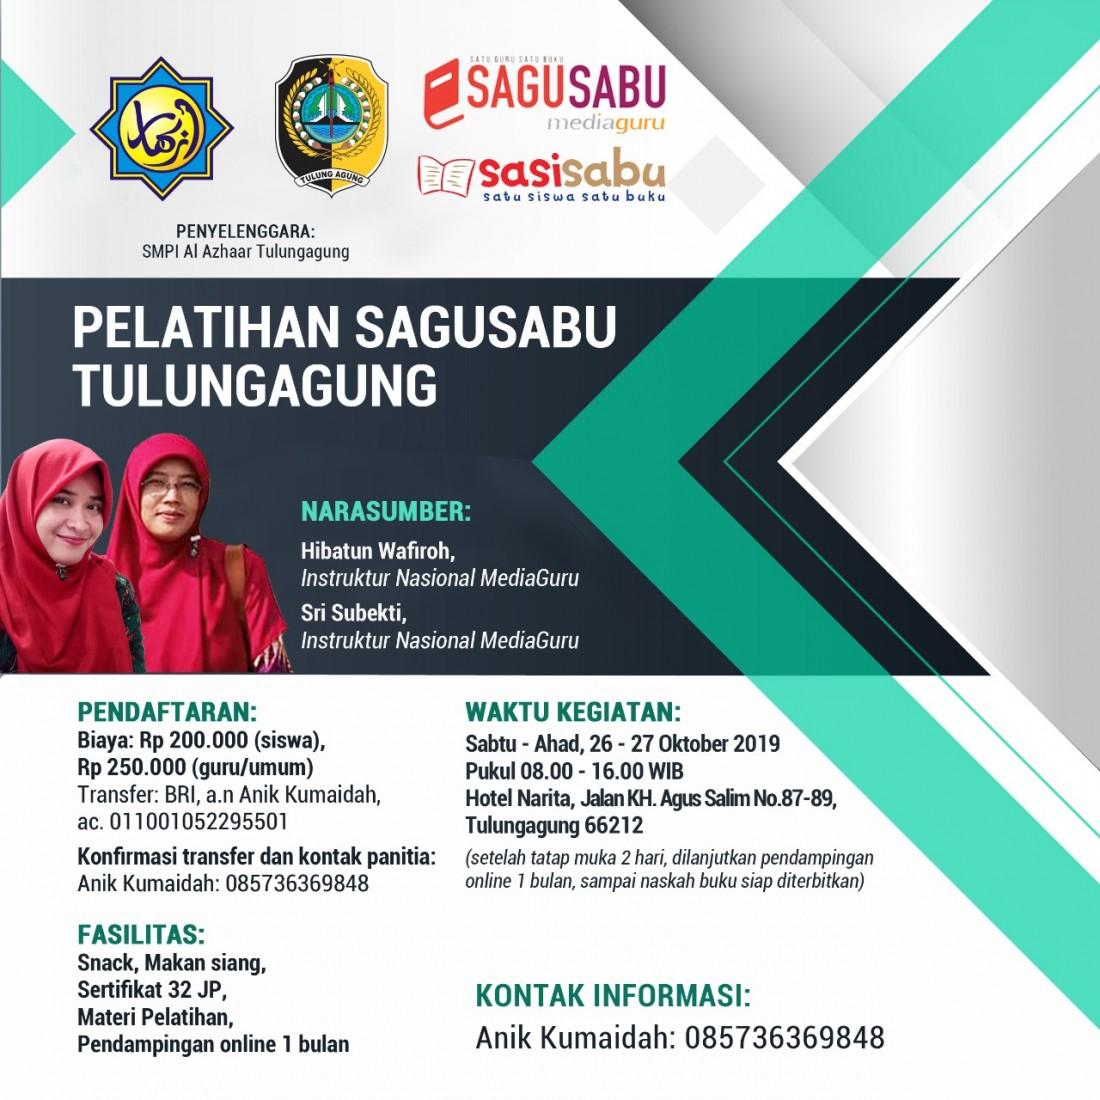 Pelatihan Menulis Buku MediaGuru Tulungagung (26 - 27 Oktober 2019)